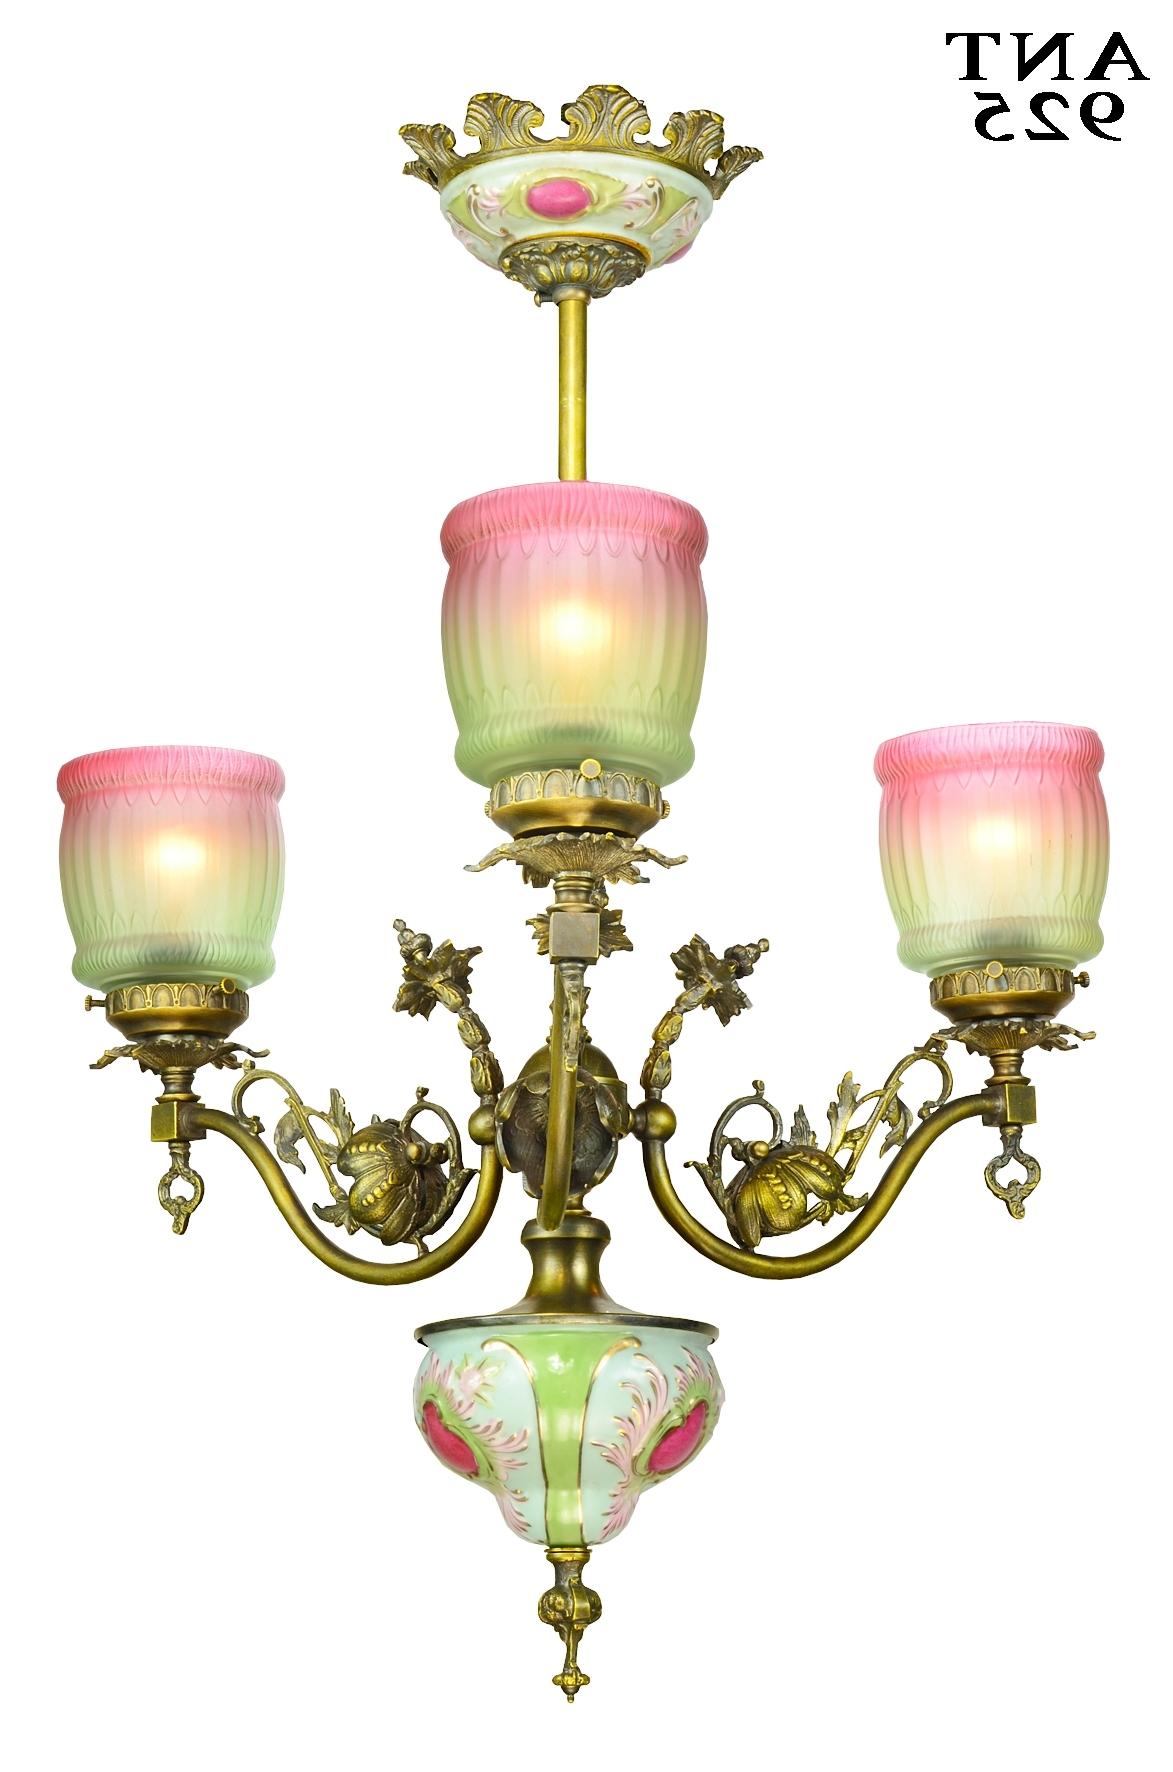 Edwardian Chandelier Intended For Famous Vintage Hardware & Lighting – Antiqued Brass Finished Fhree Light (Gallery 17 of 20)